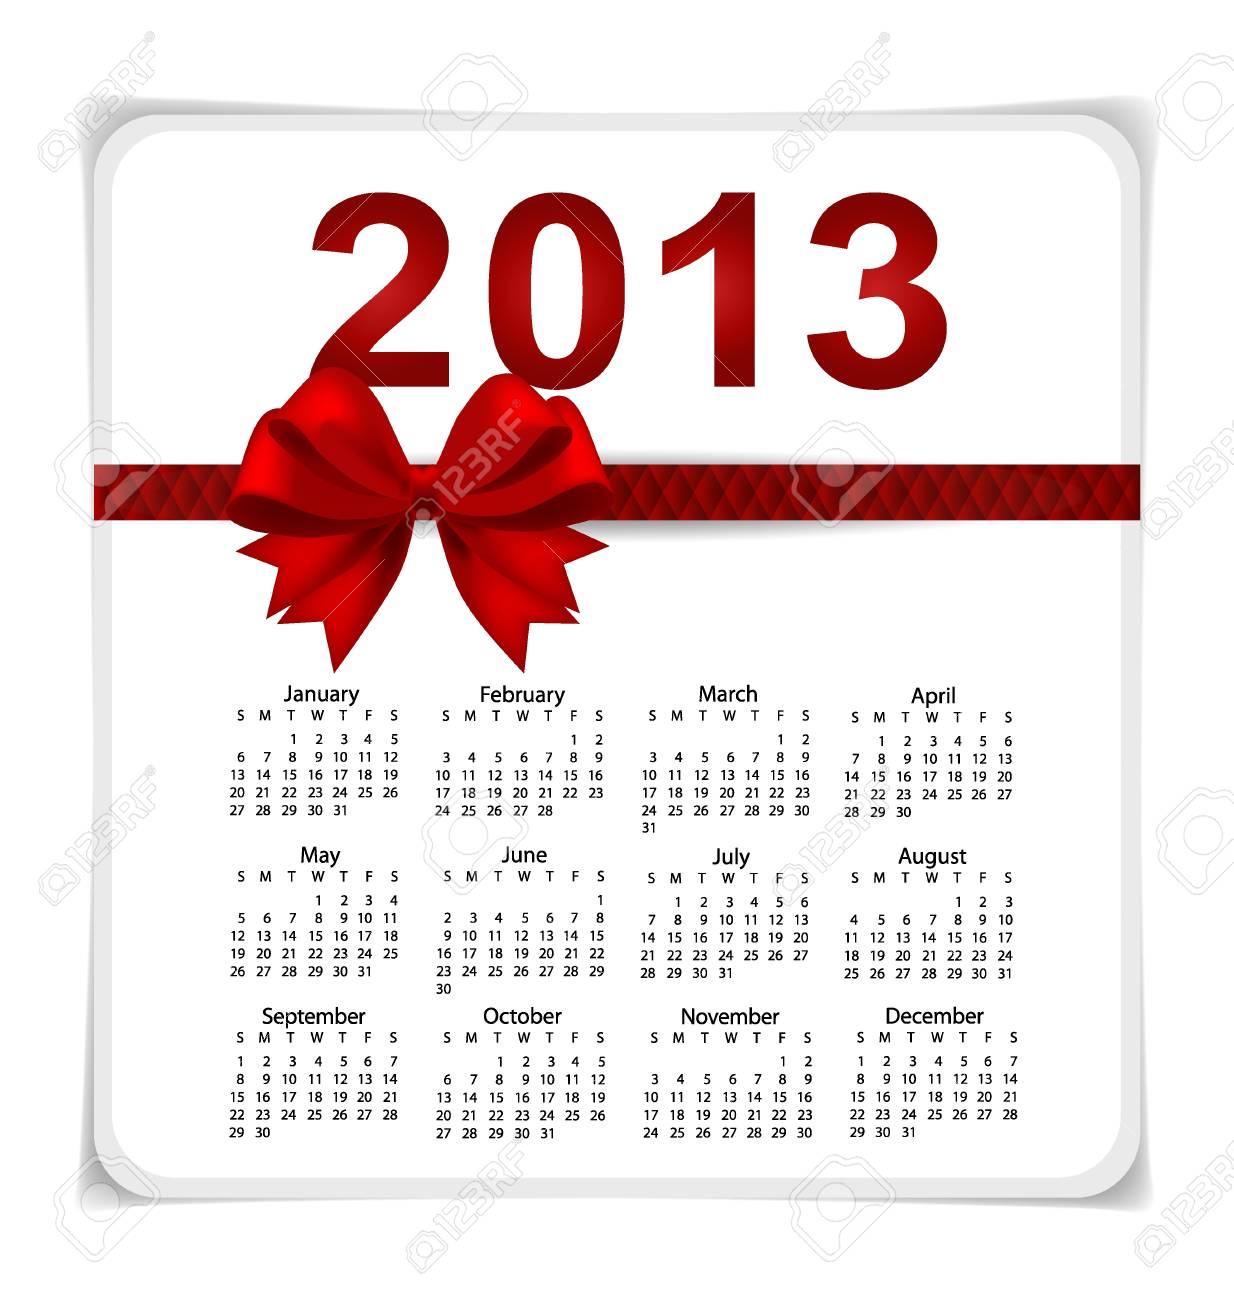 Simple 2013 year calendar, vector illustration. Stock Vector - 17101768